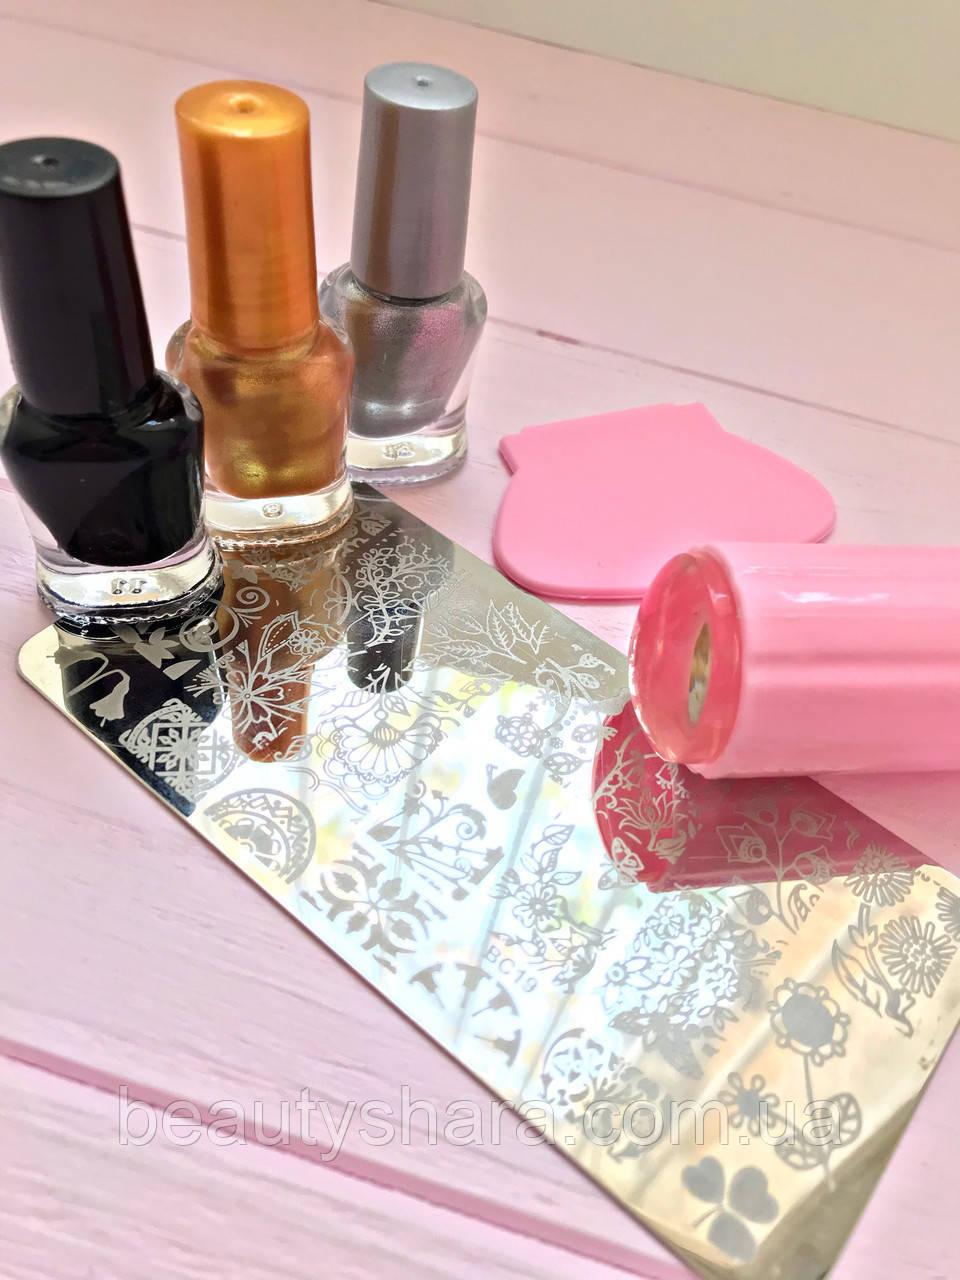 Стемпинг для ногтей + Пластина + 3 краски для стемпинга Набор